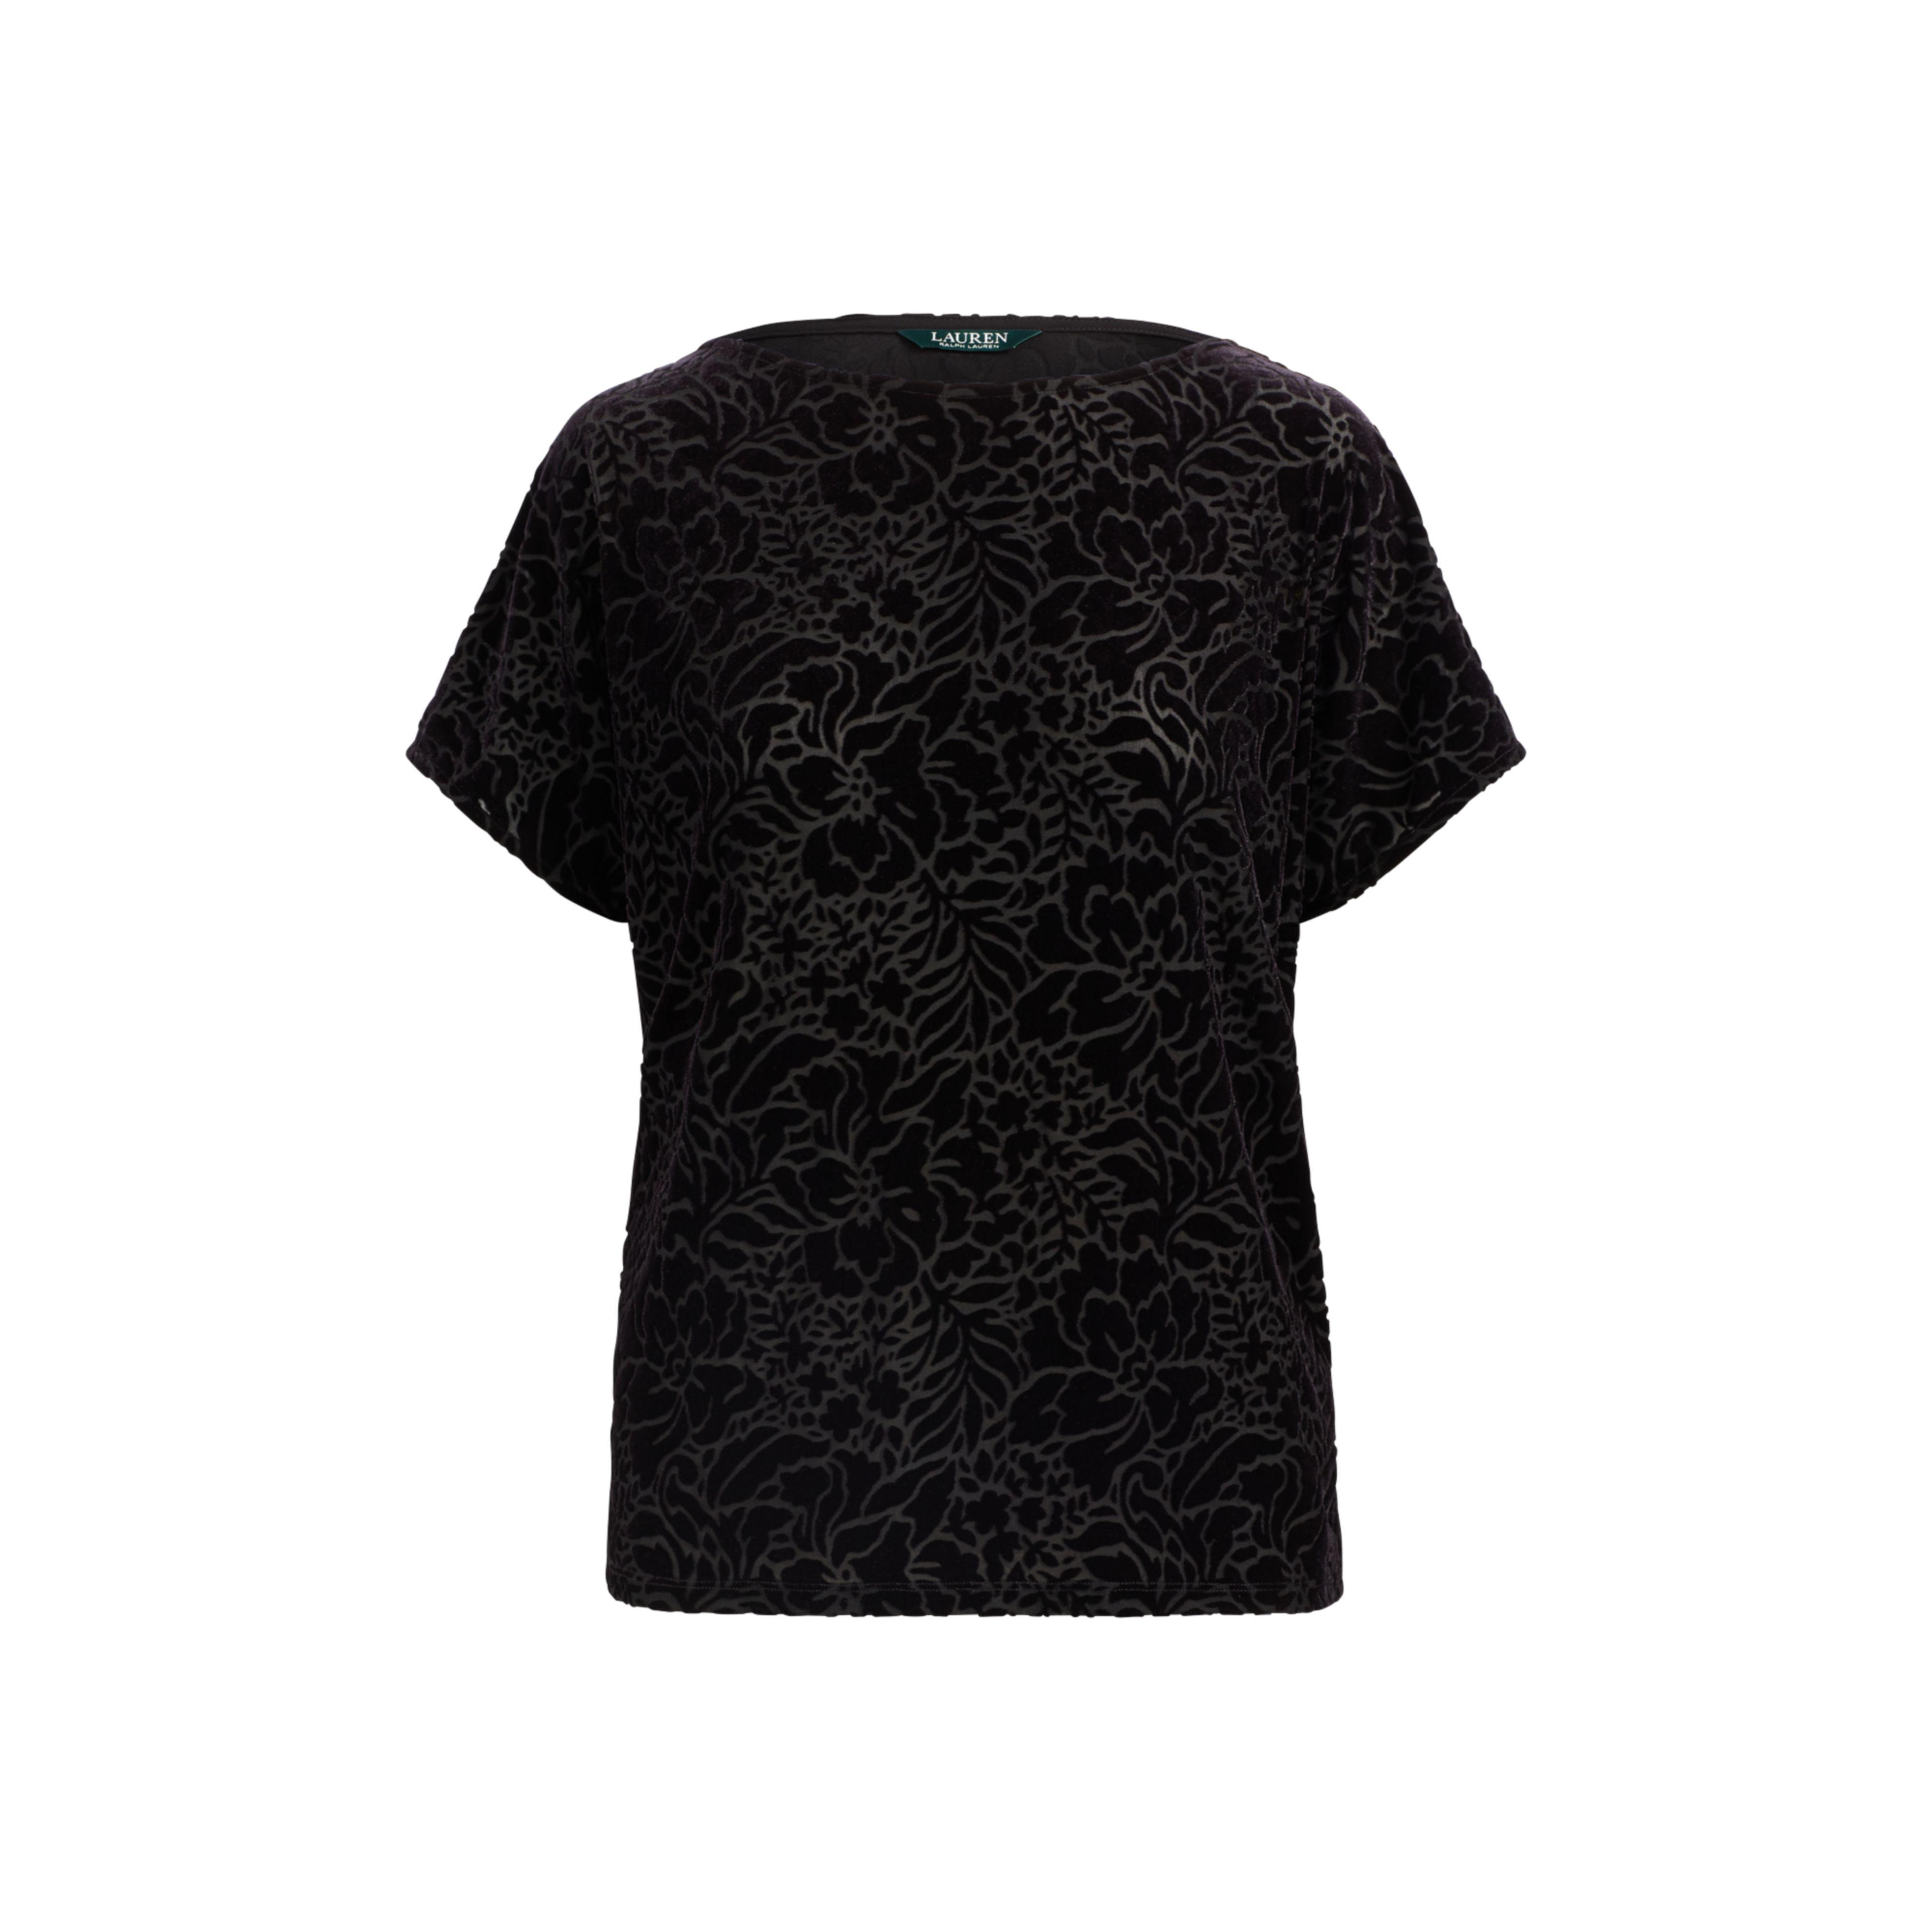 dbeef957d02 Lyst - Ralph Lauren Floral Burn-out Velvet Top in Black